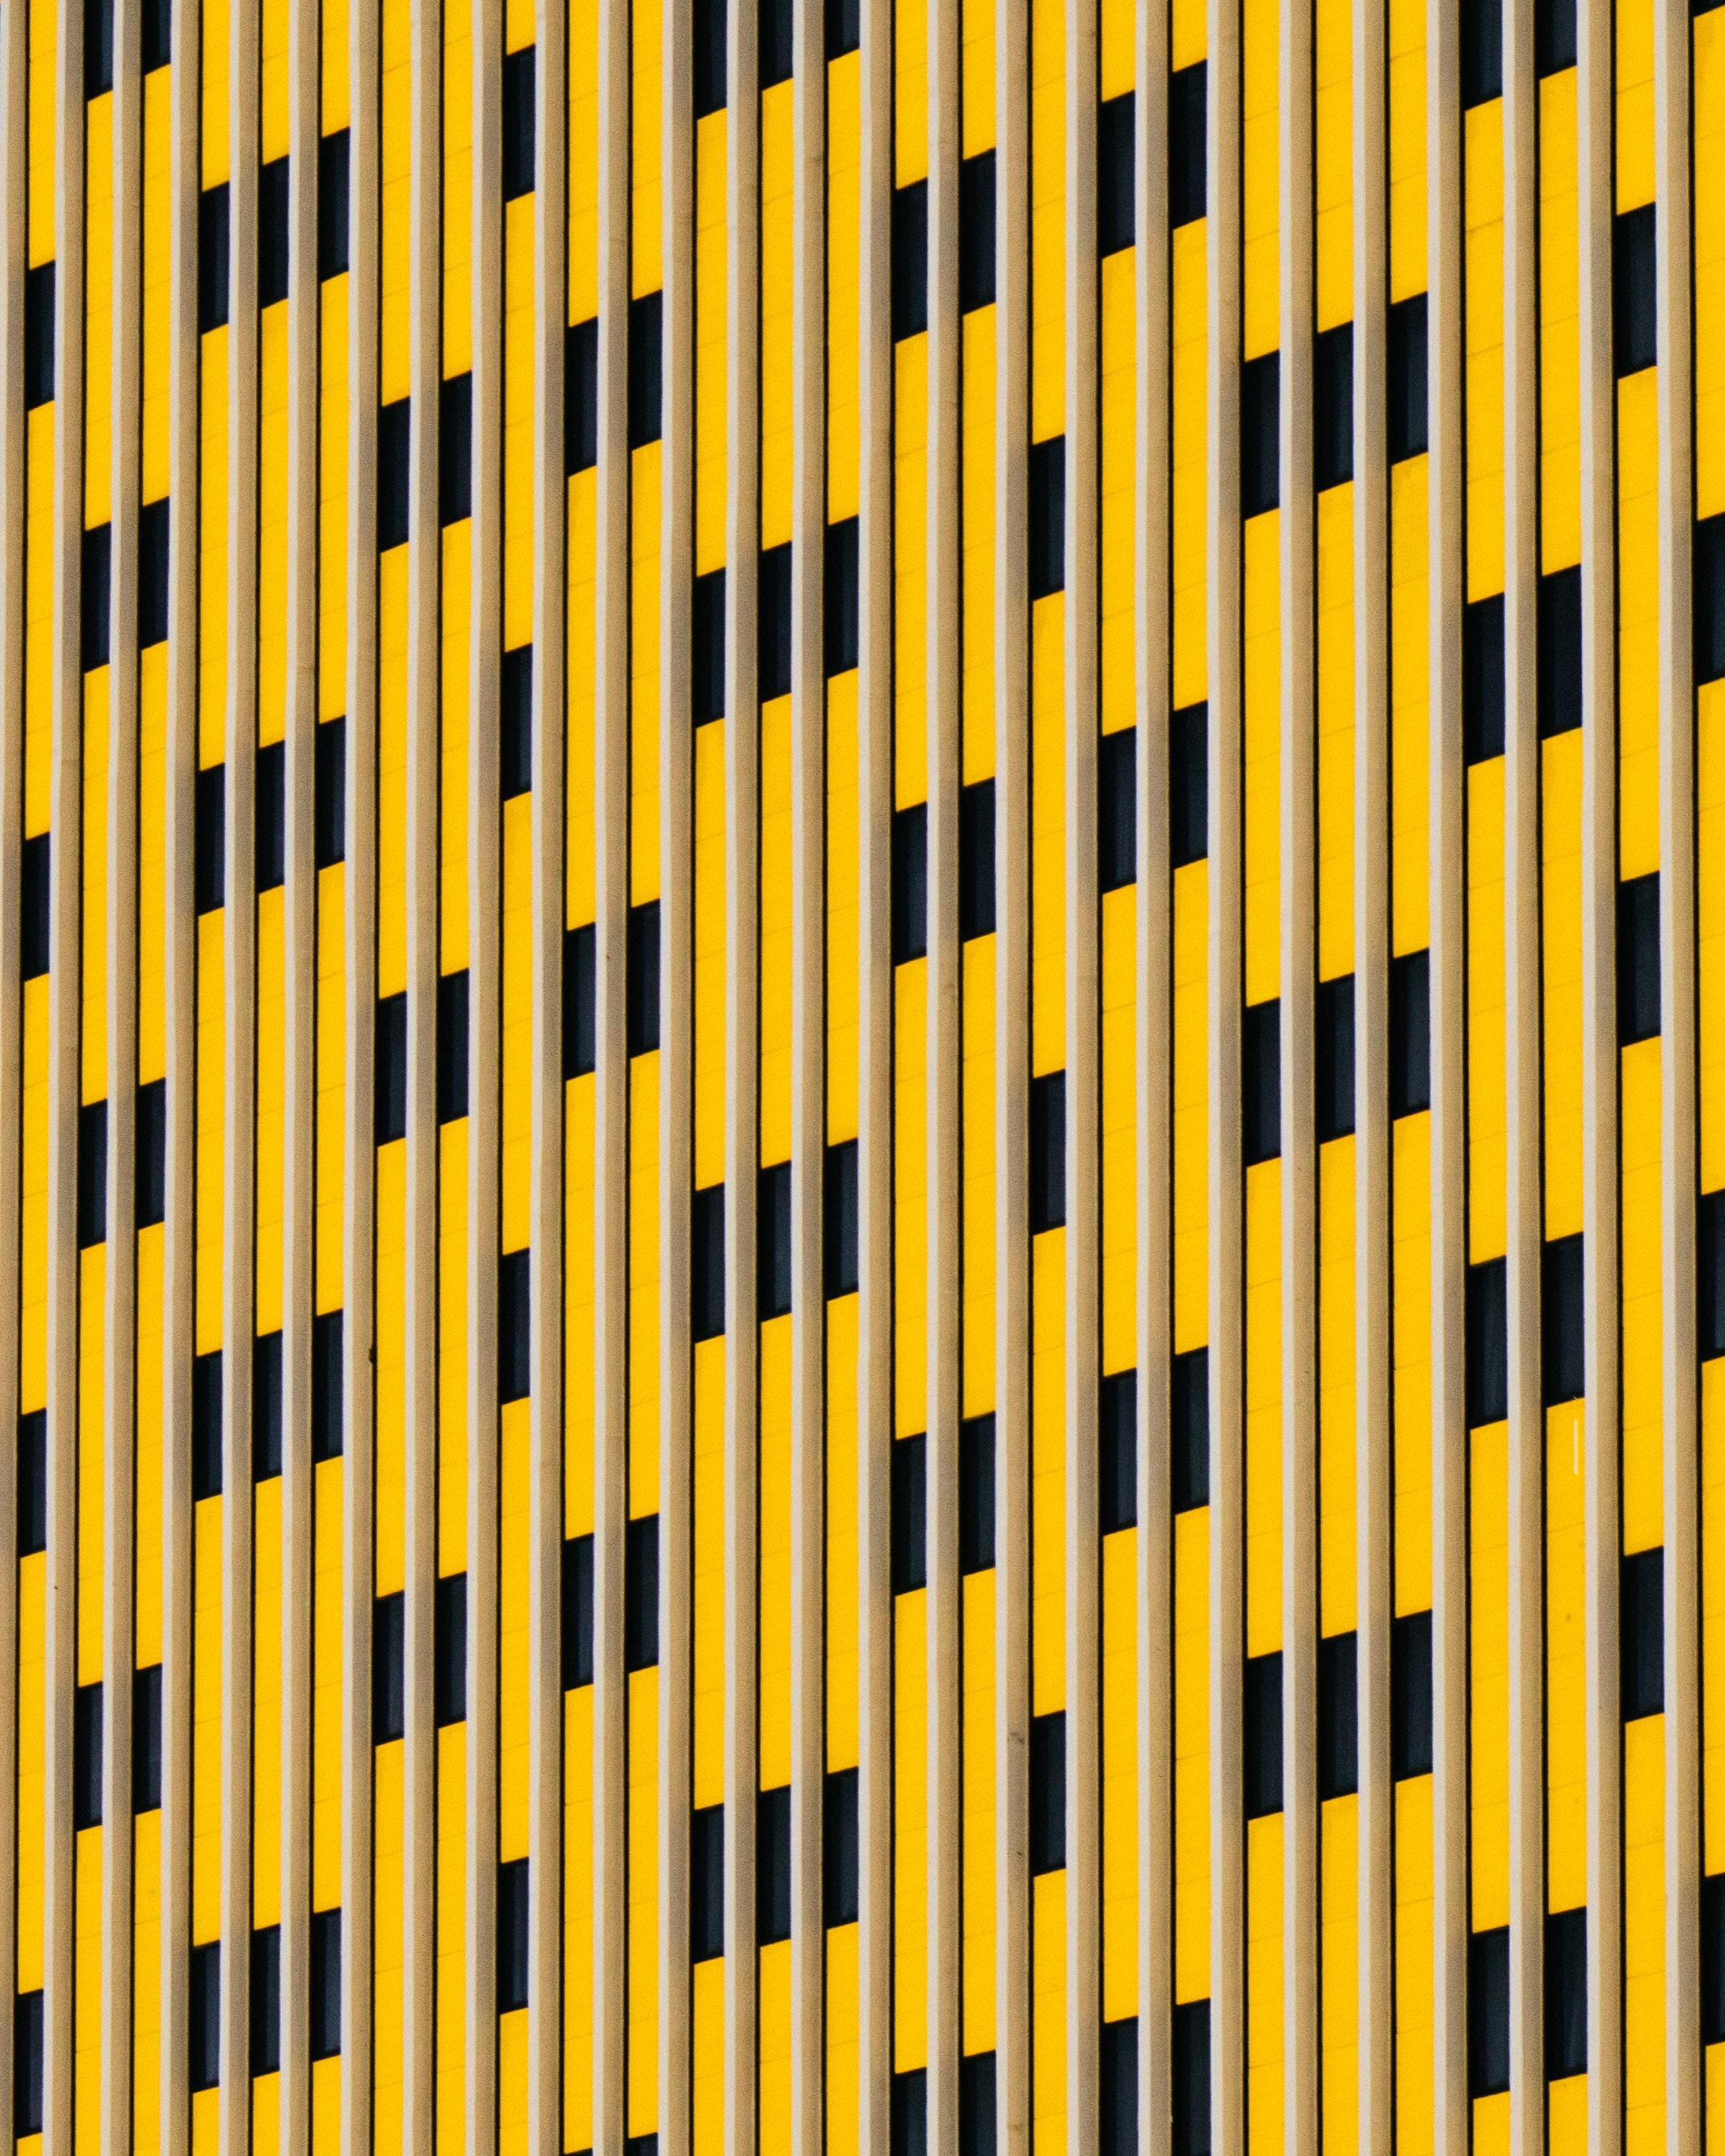 Foto stok gratis tentang abstrak, dasar, Desain